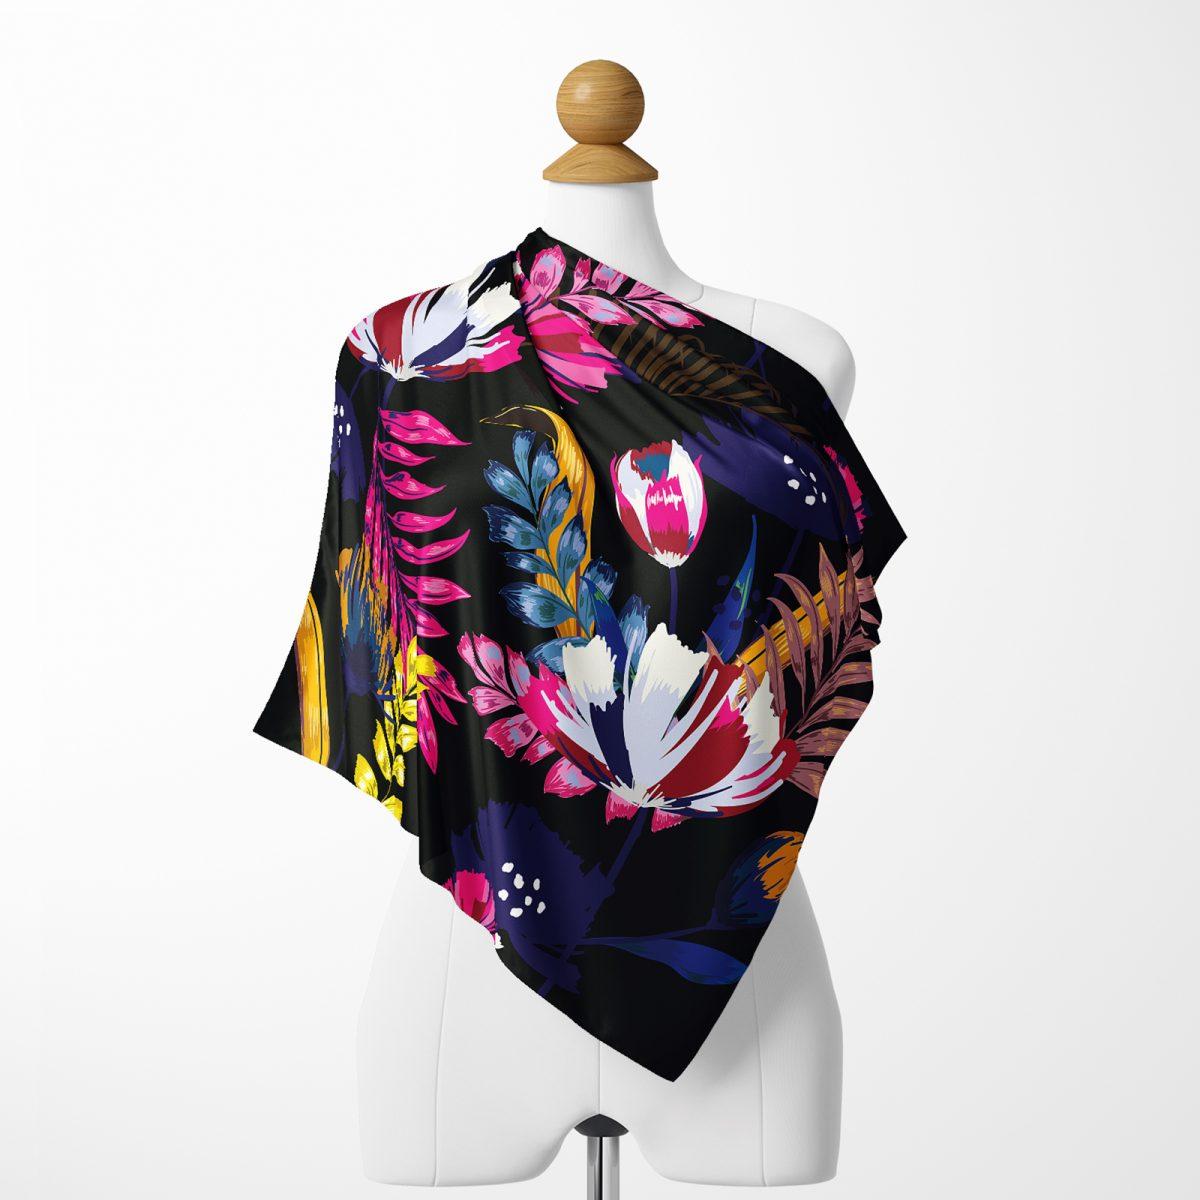 Realhomes Moda Summer Özel Seri Dijital Baskılı Modern Tivil Eşarp Realhomes